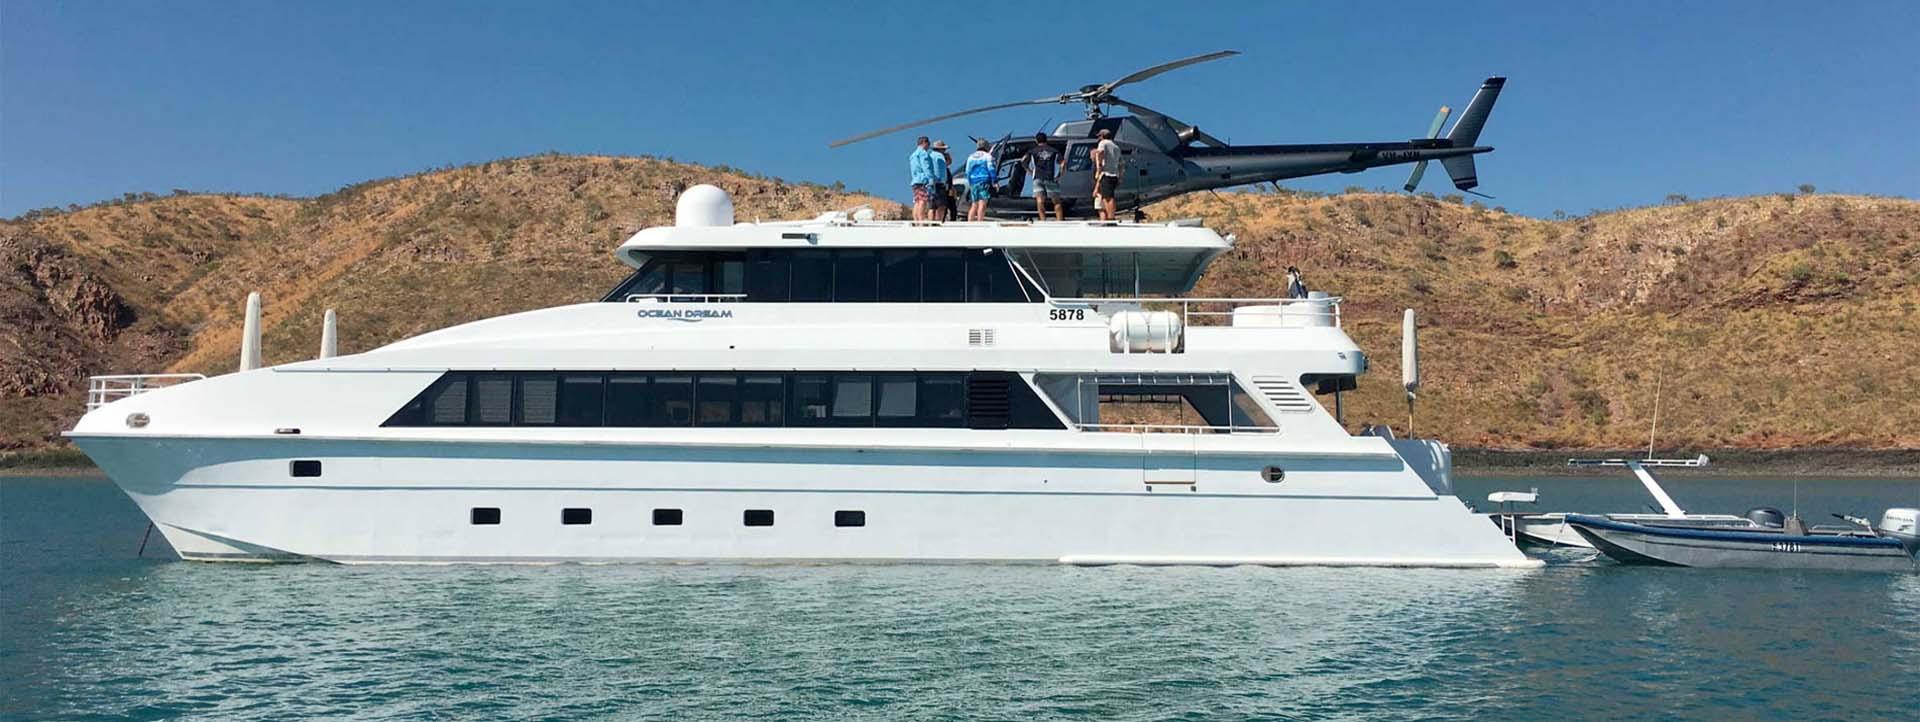 OCEAN DREAM helicopter Kimberley cruises